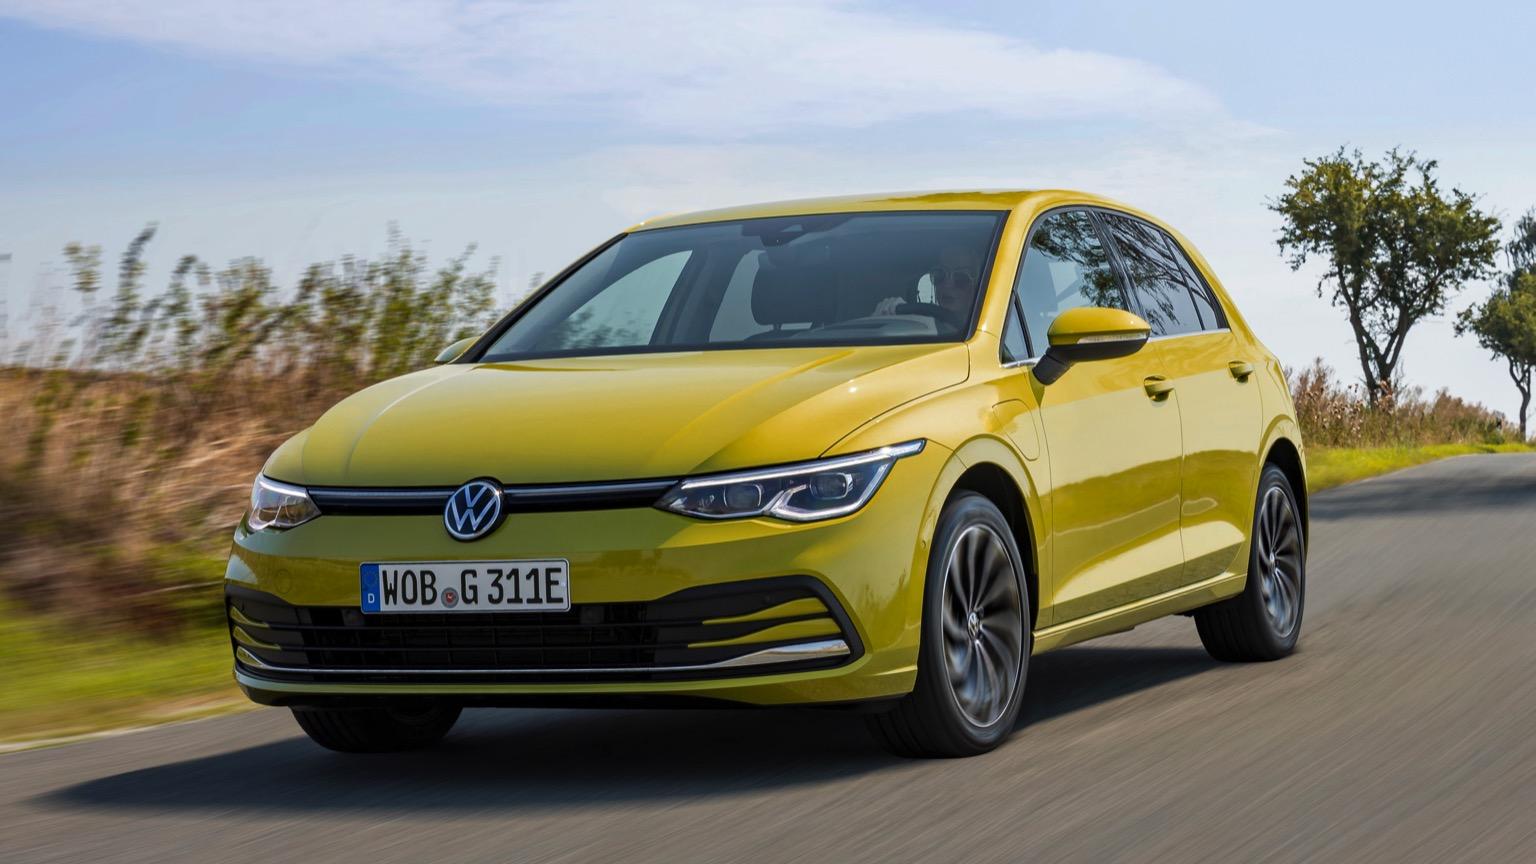 Volkswagen Golf 1.4 TSI eHybrid (2020)